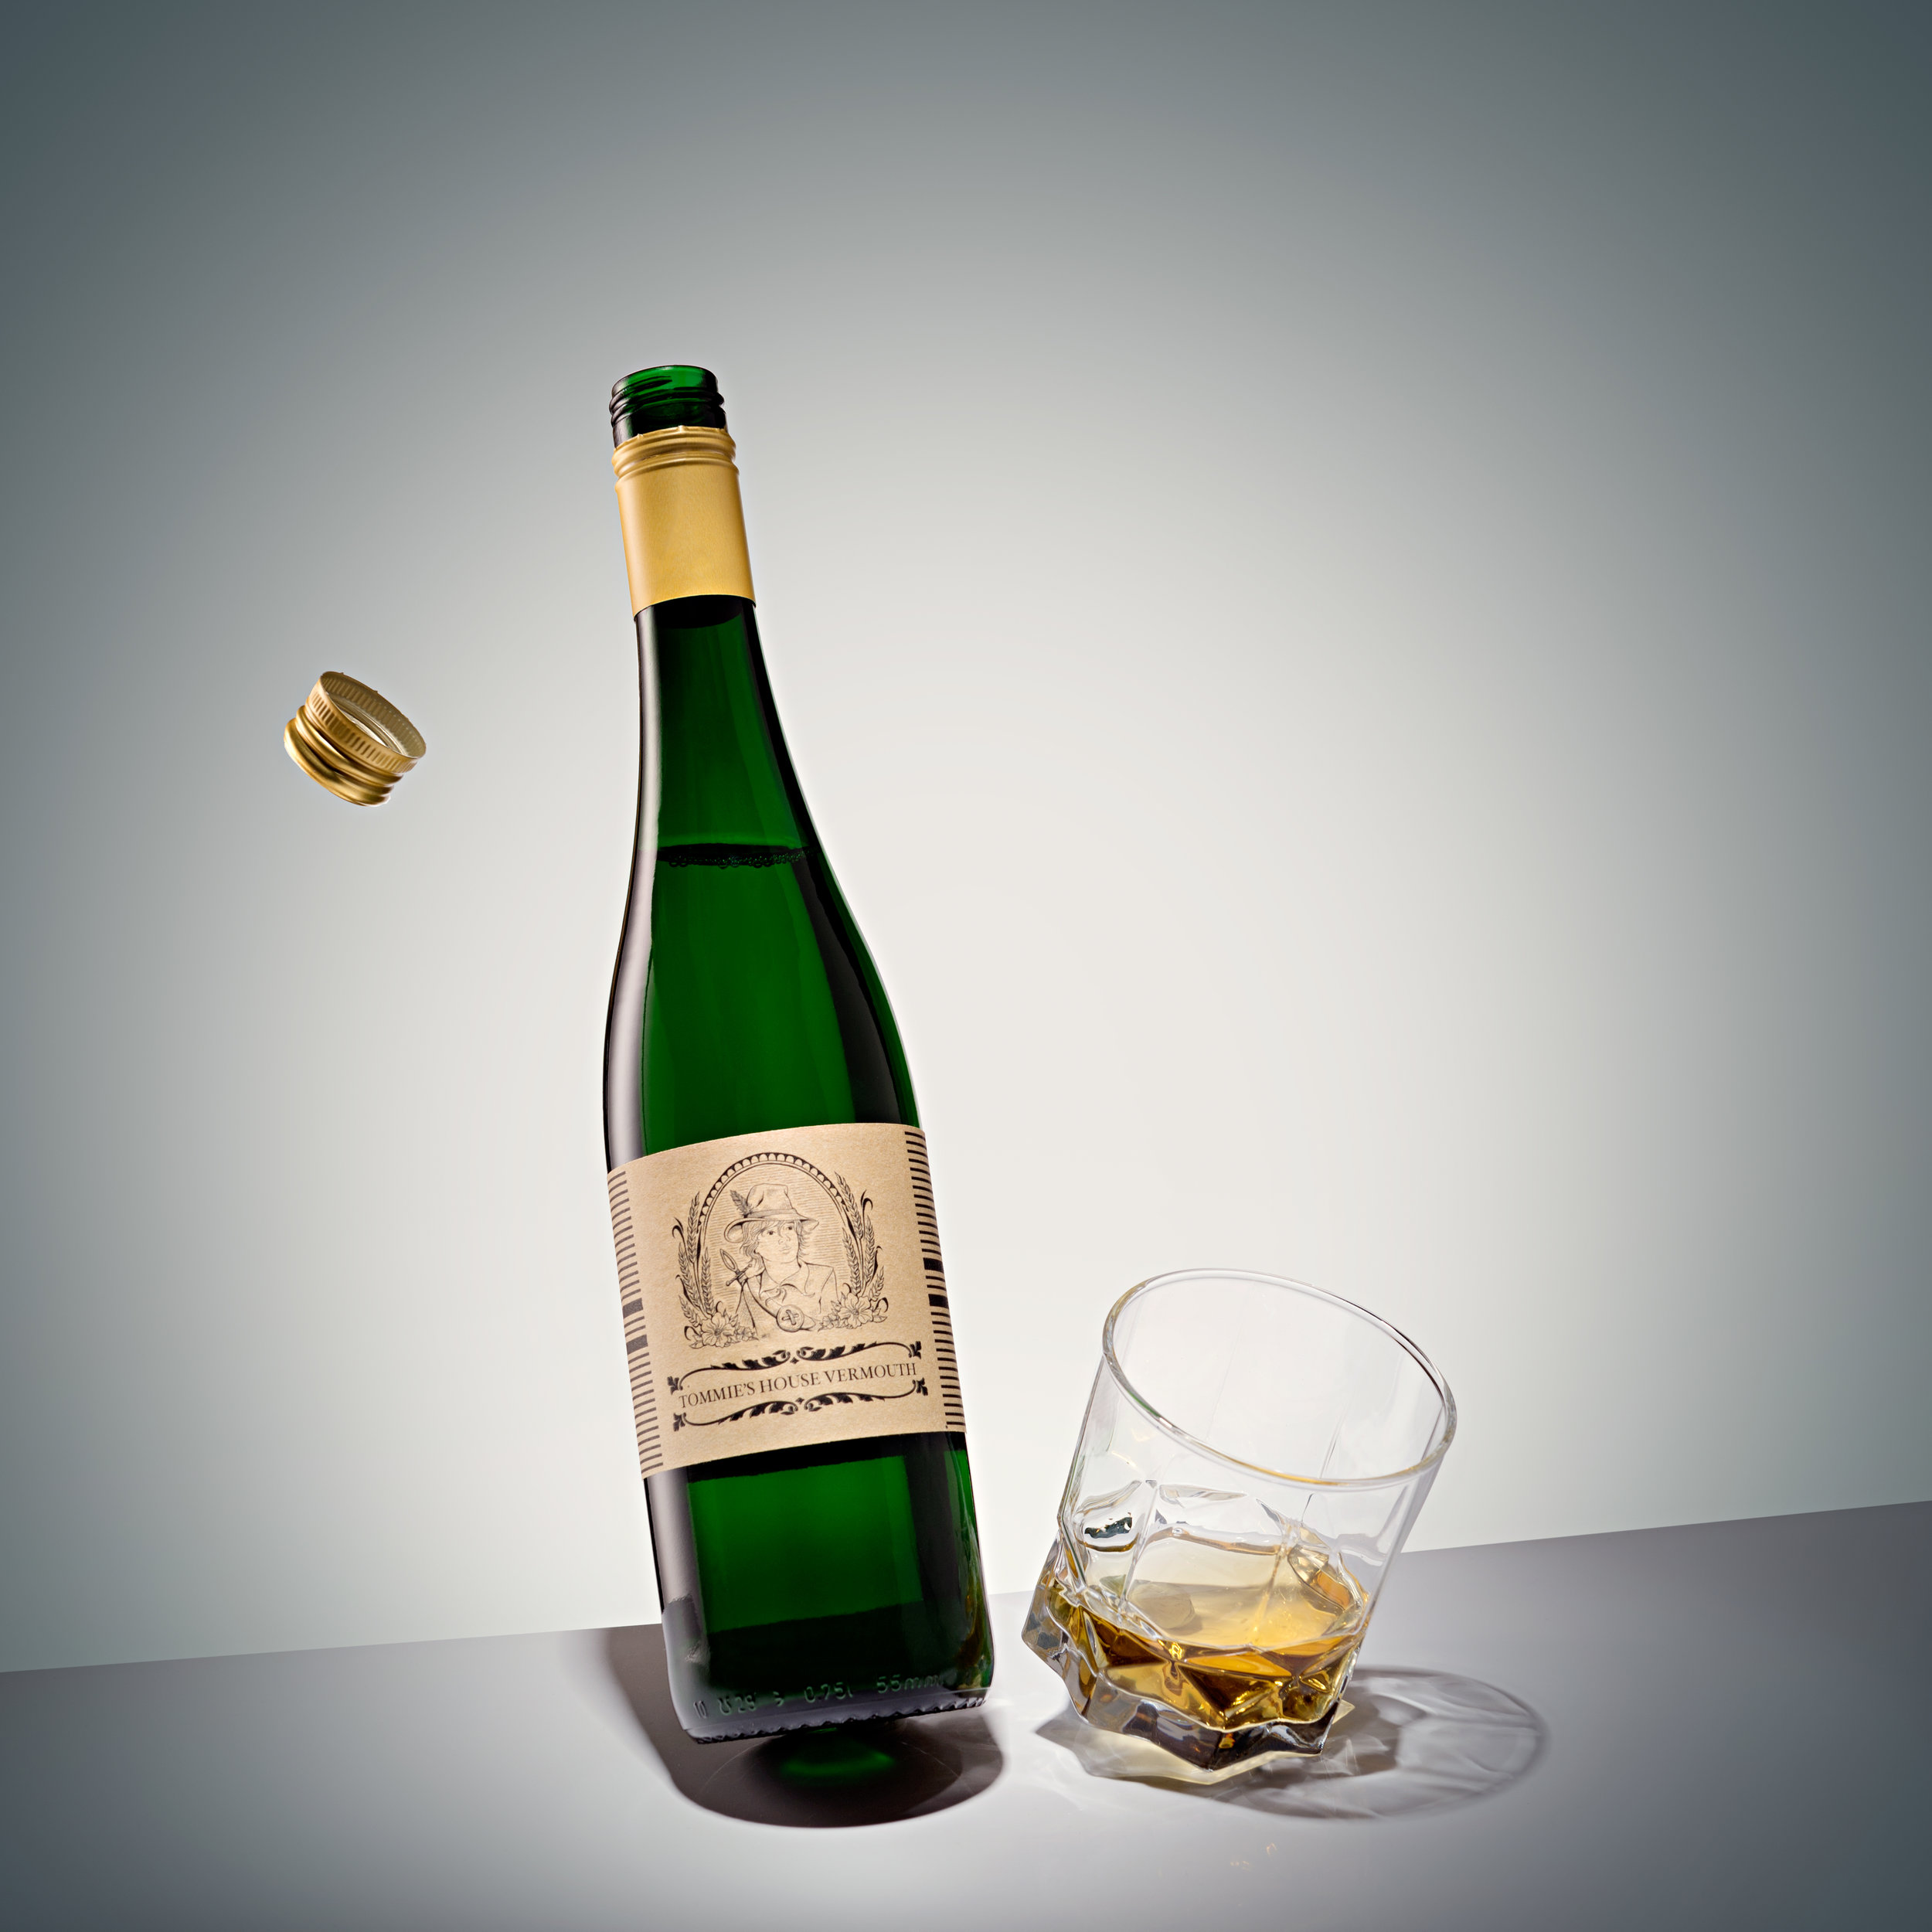 Vermouth3792-Edit.jpg